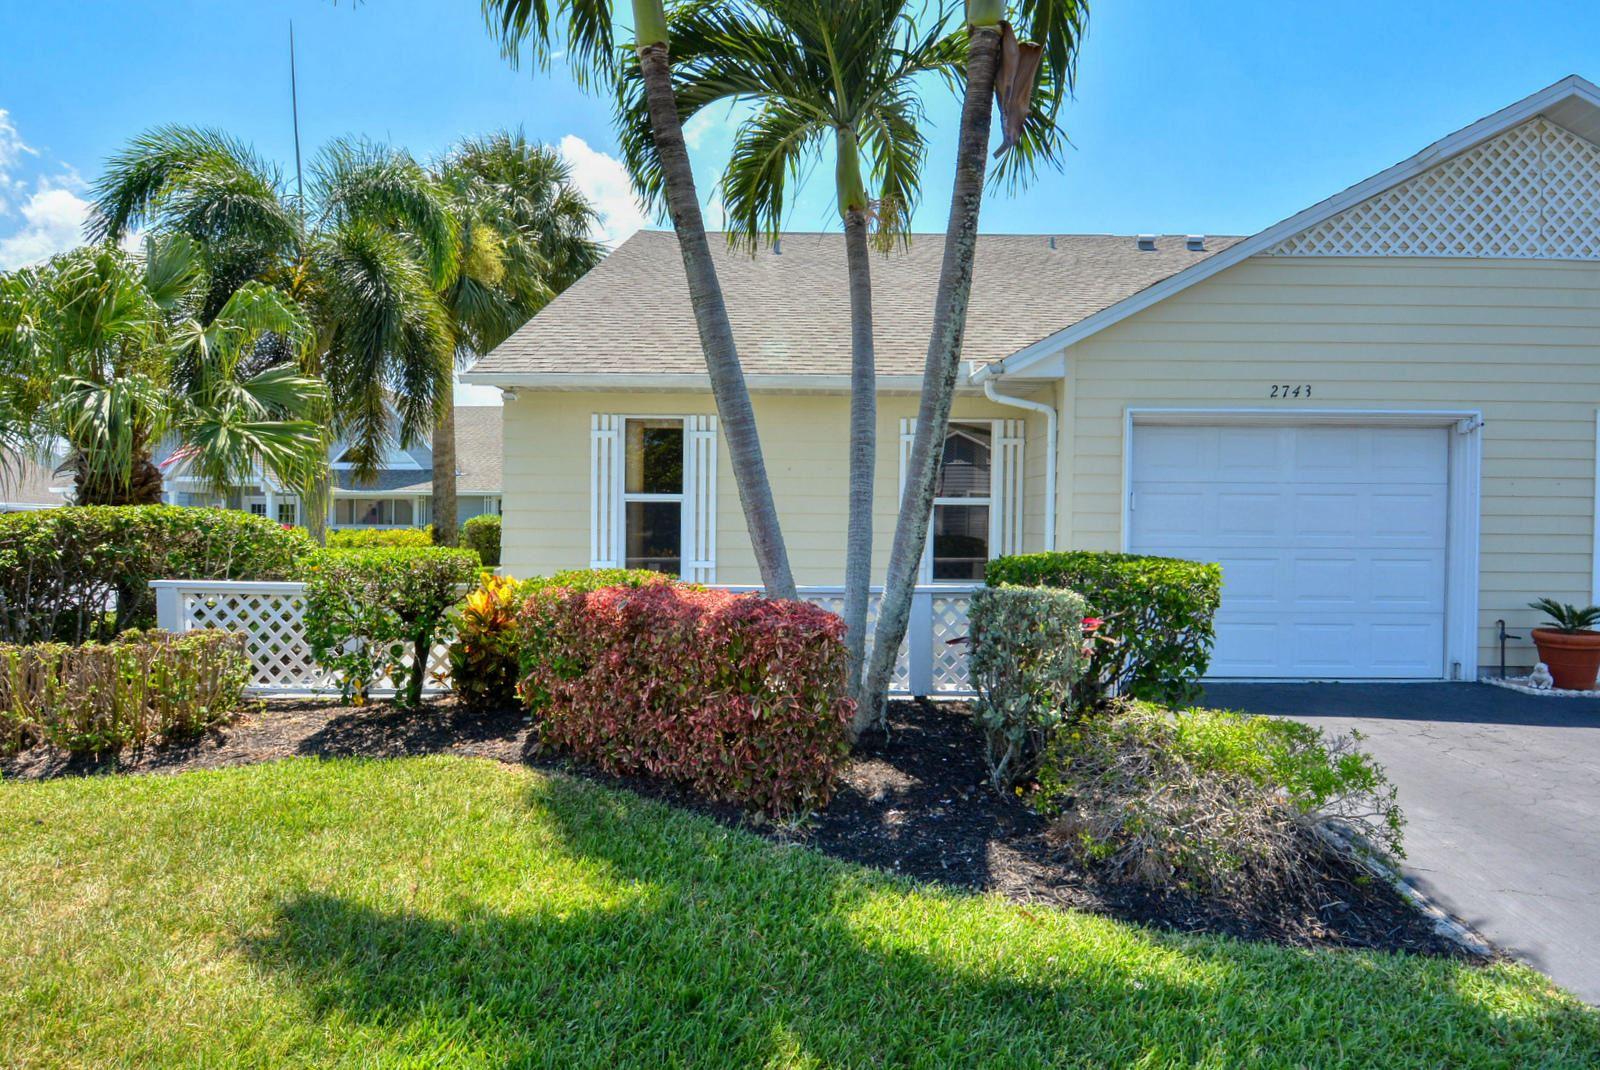 2743 SE Tropical East Circle, Port Saint Lucie, FL 34952 - MLS#: RX-10714568